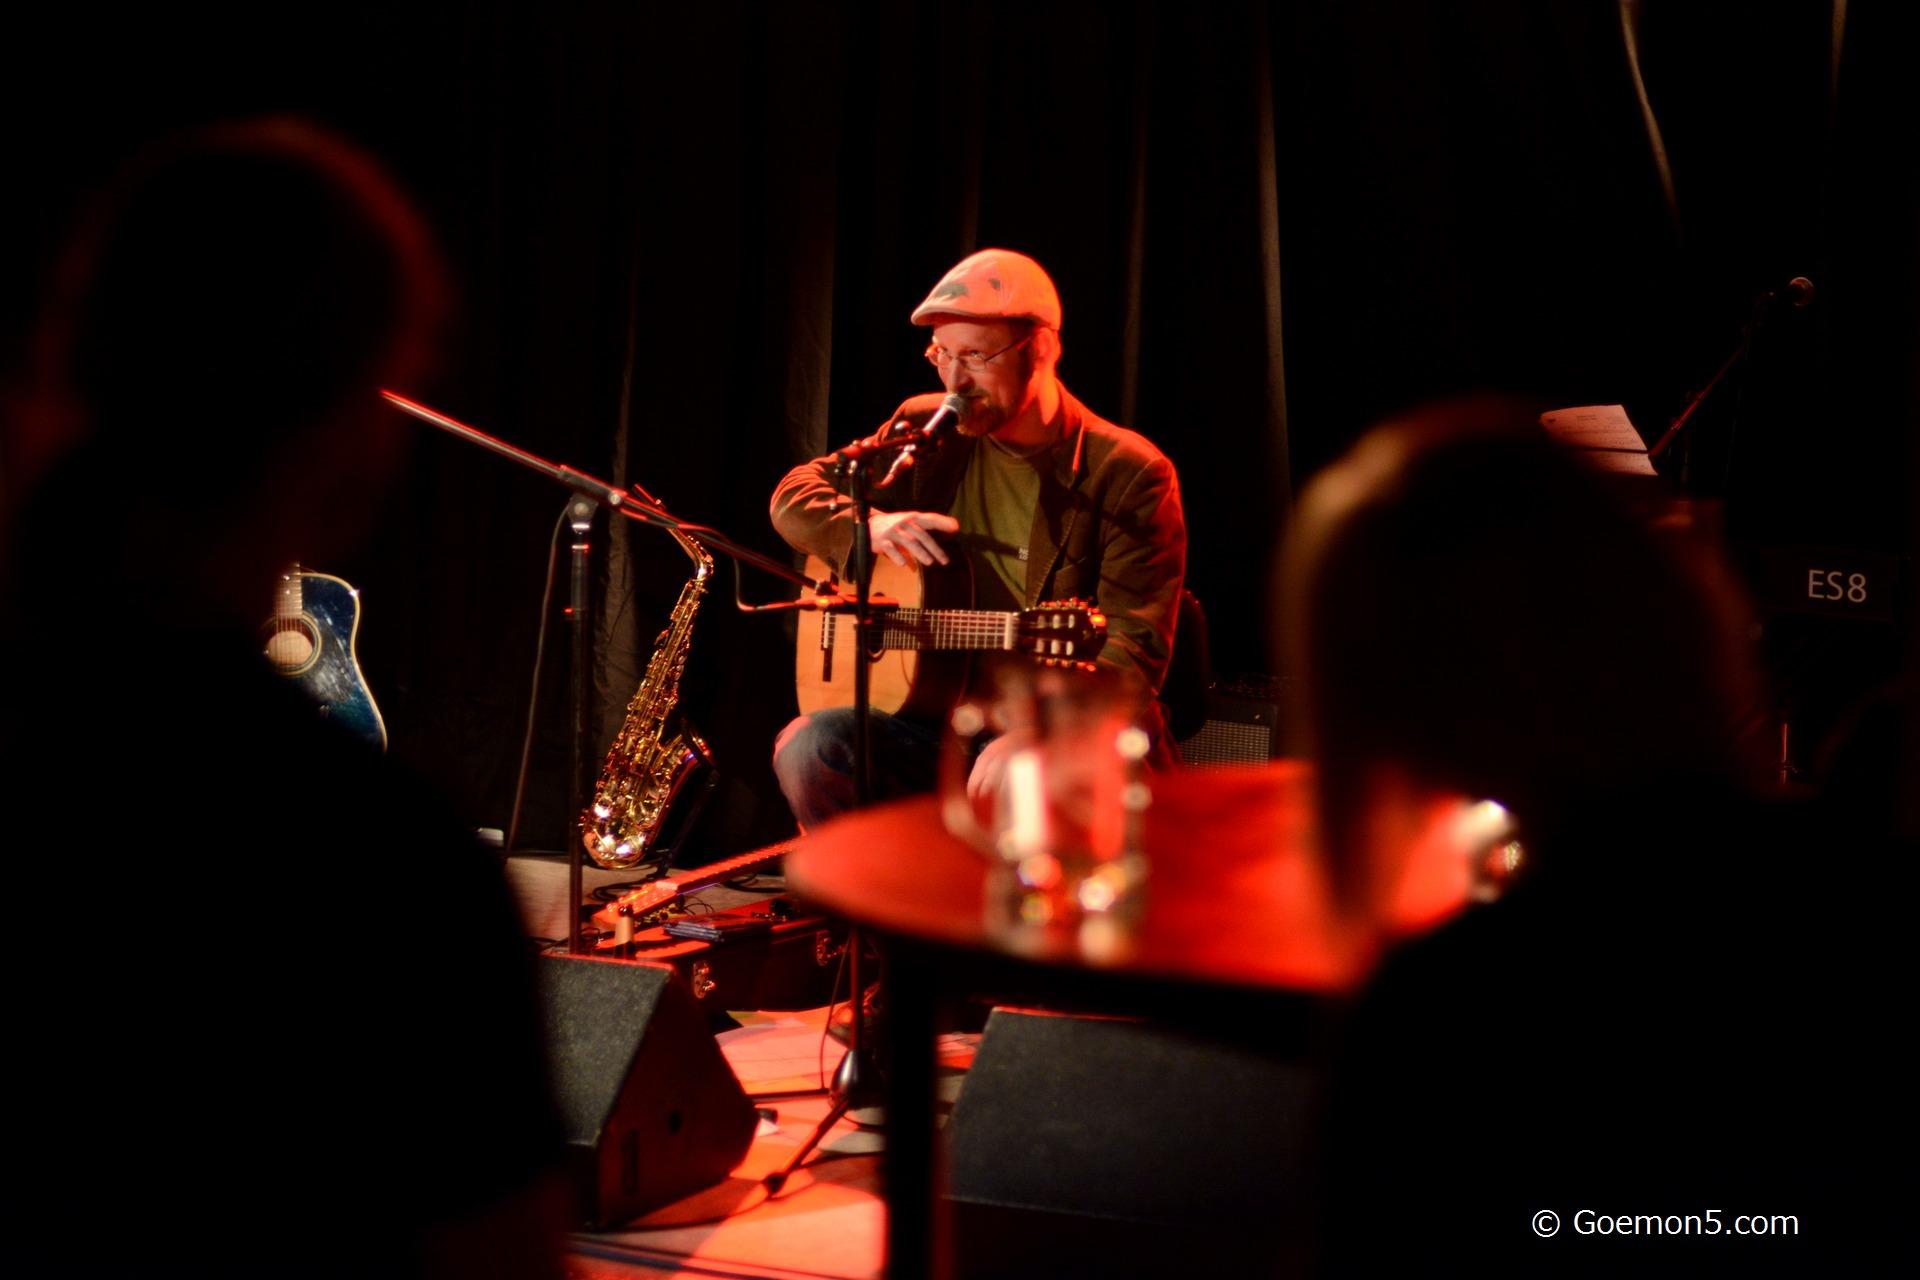 Thomas Strauch at ParkClub 10